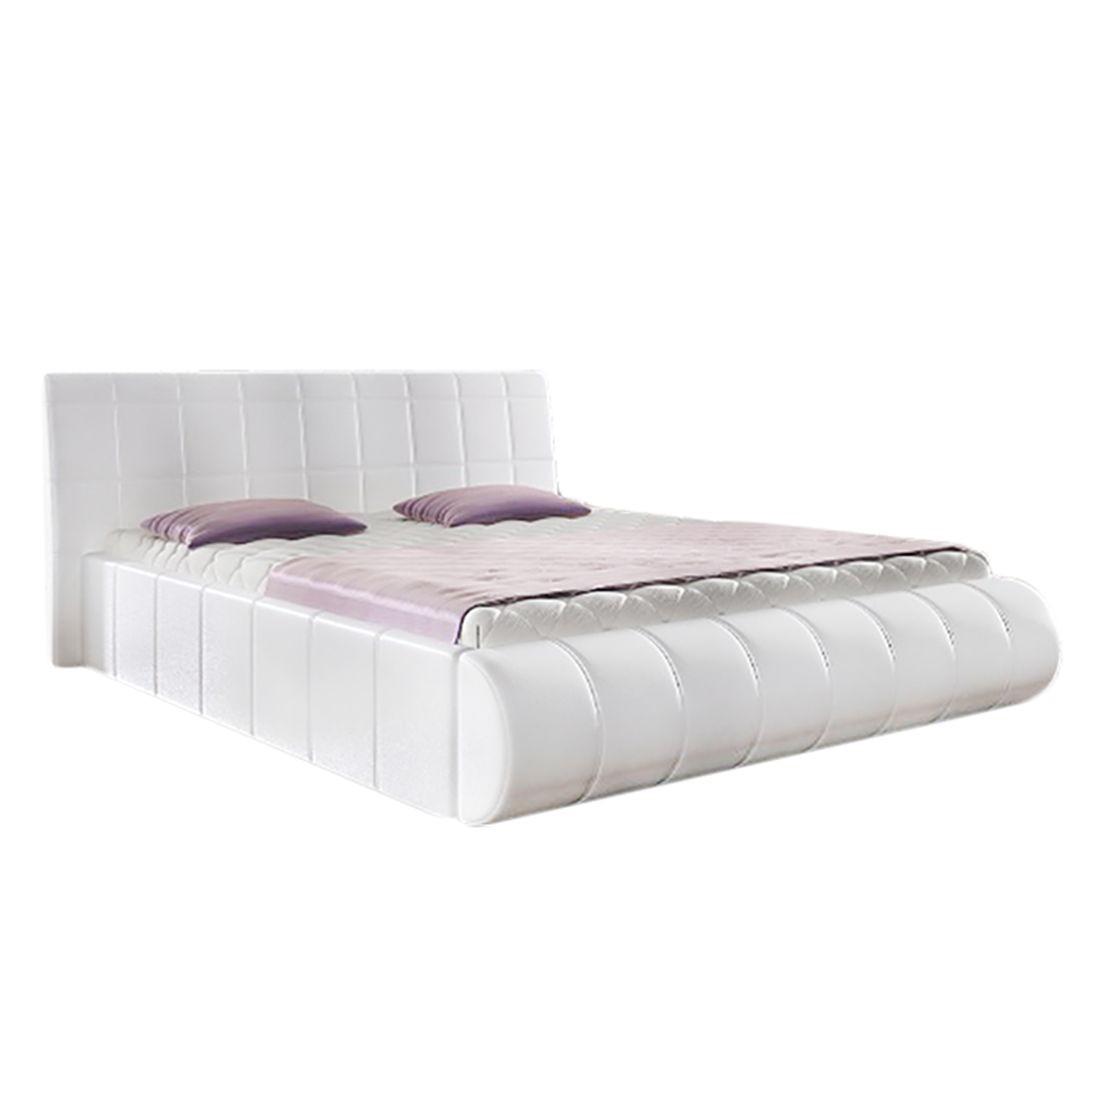 goedkoop Gestoffeerd bed Elisse inclusief bedlades kunstleer wit 140 x 200cm roomscape